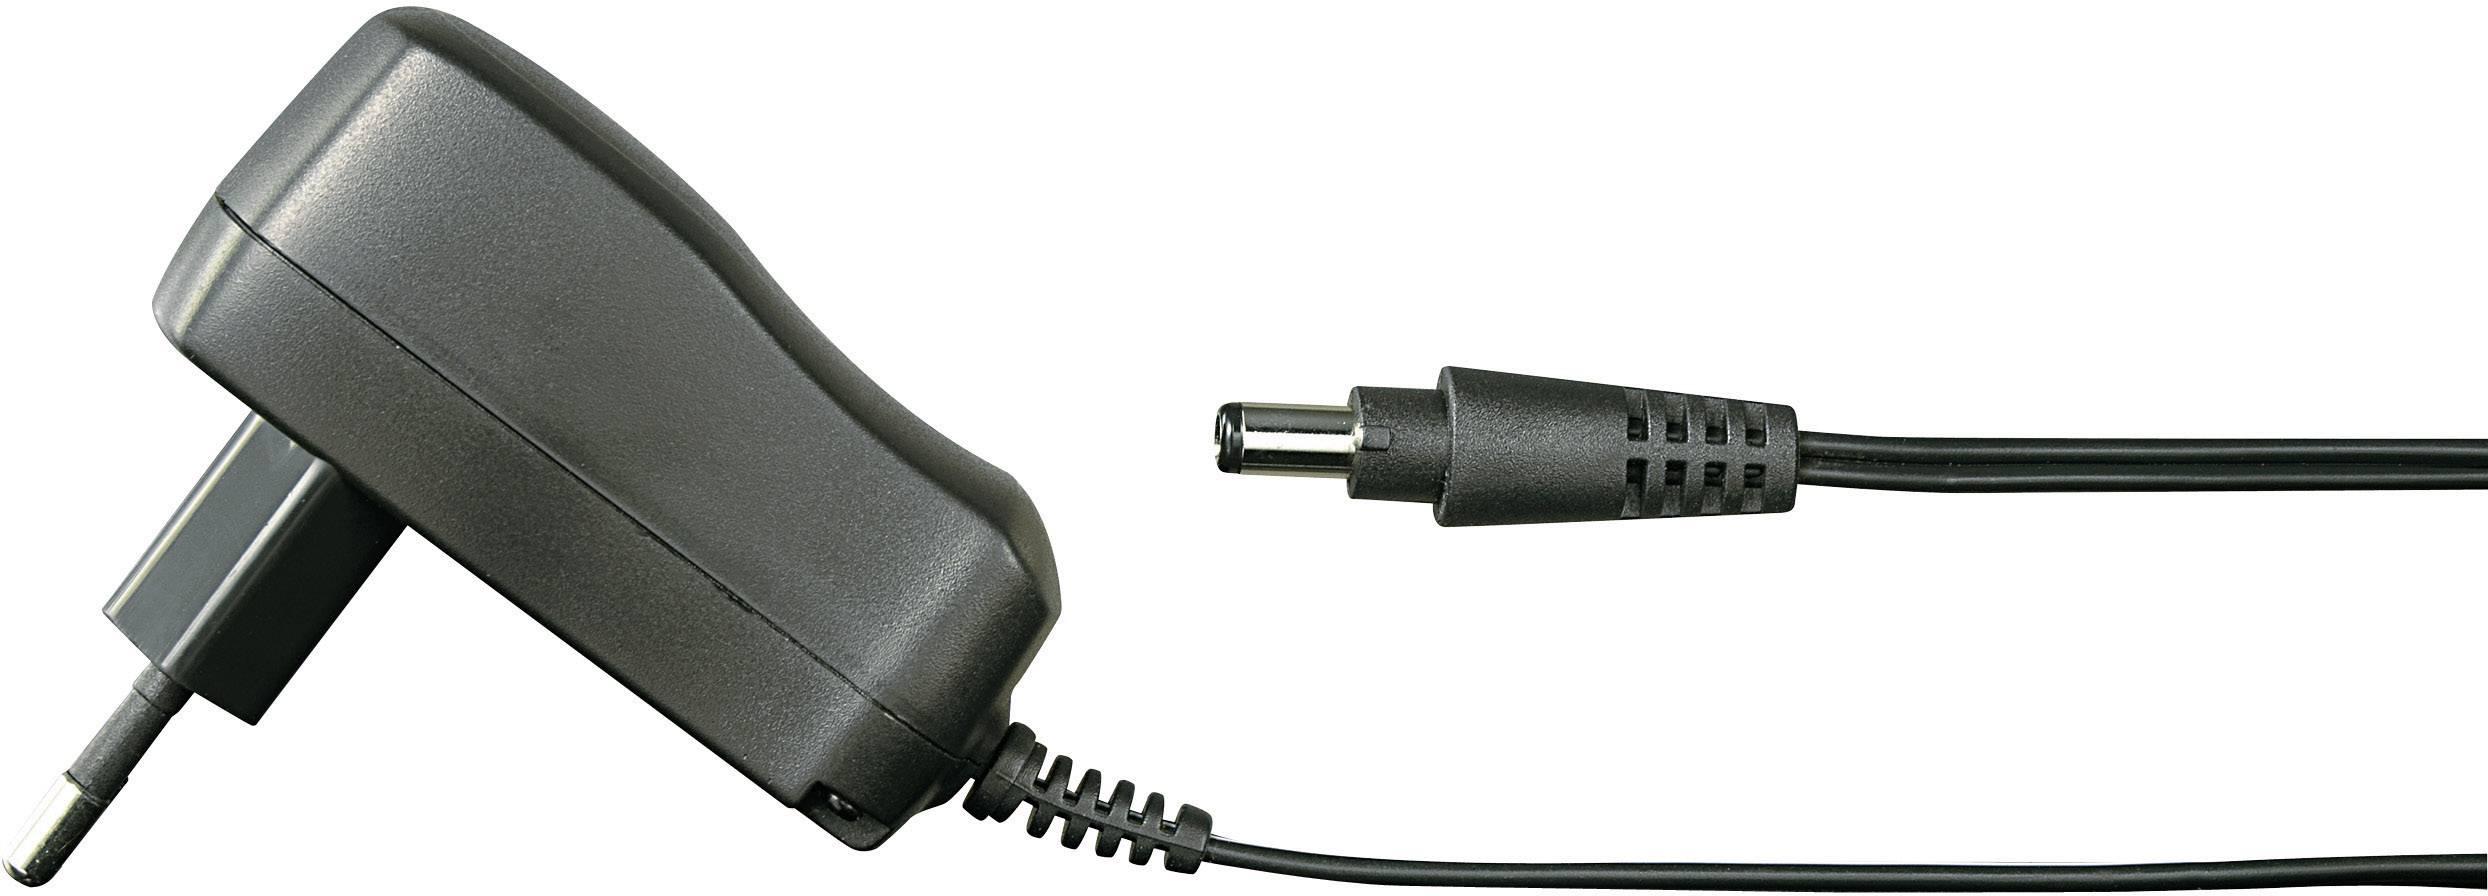 Síťový adaptér Voltcraft FPPS 9-6W, 9 V/DC, 6 W, 1,8 m